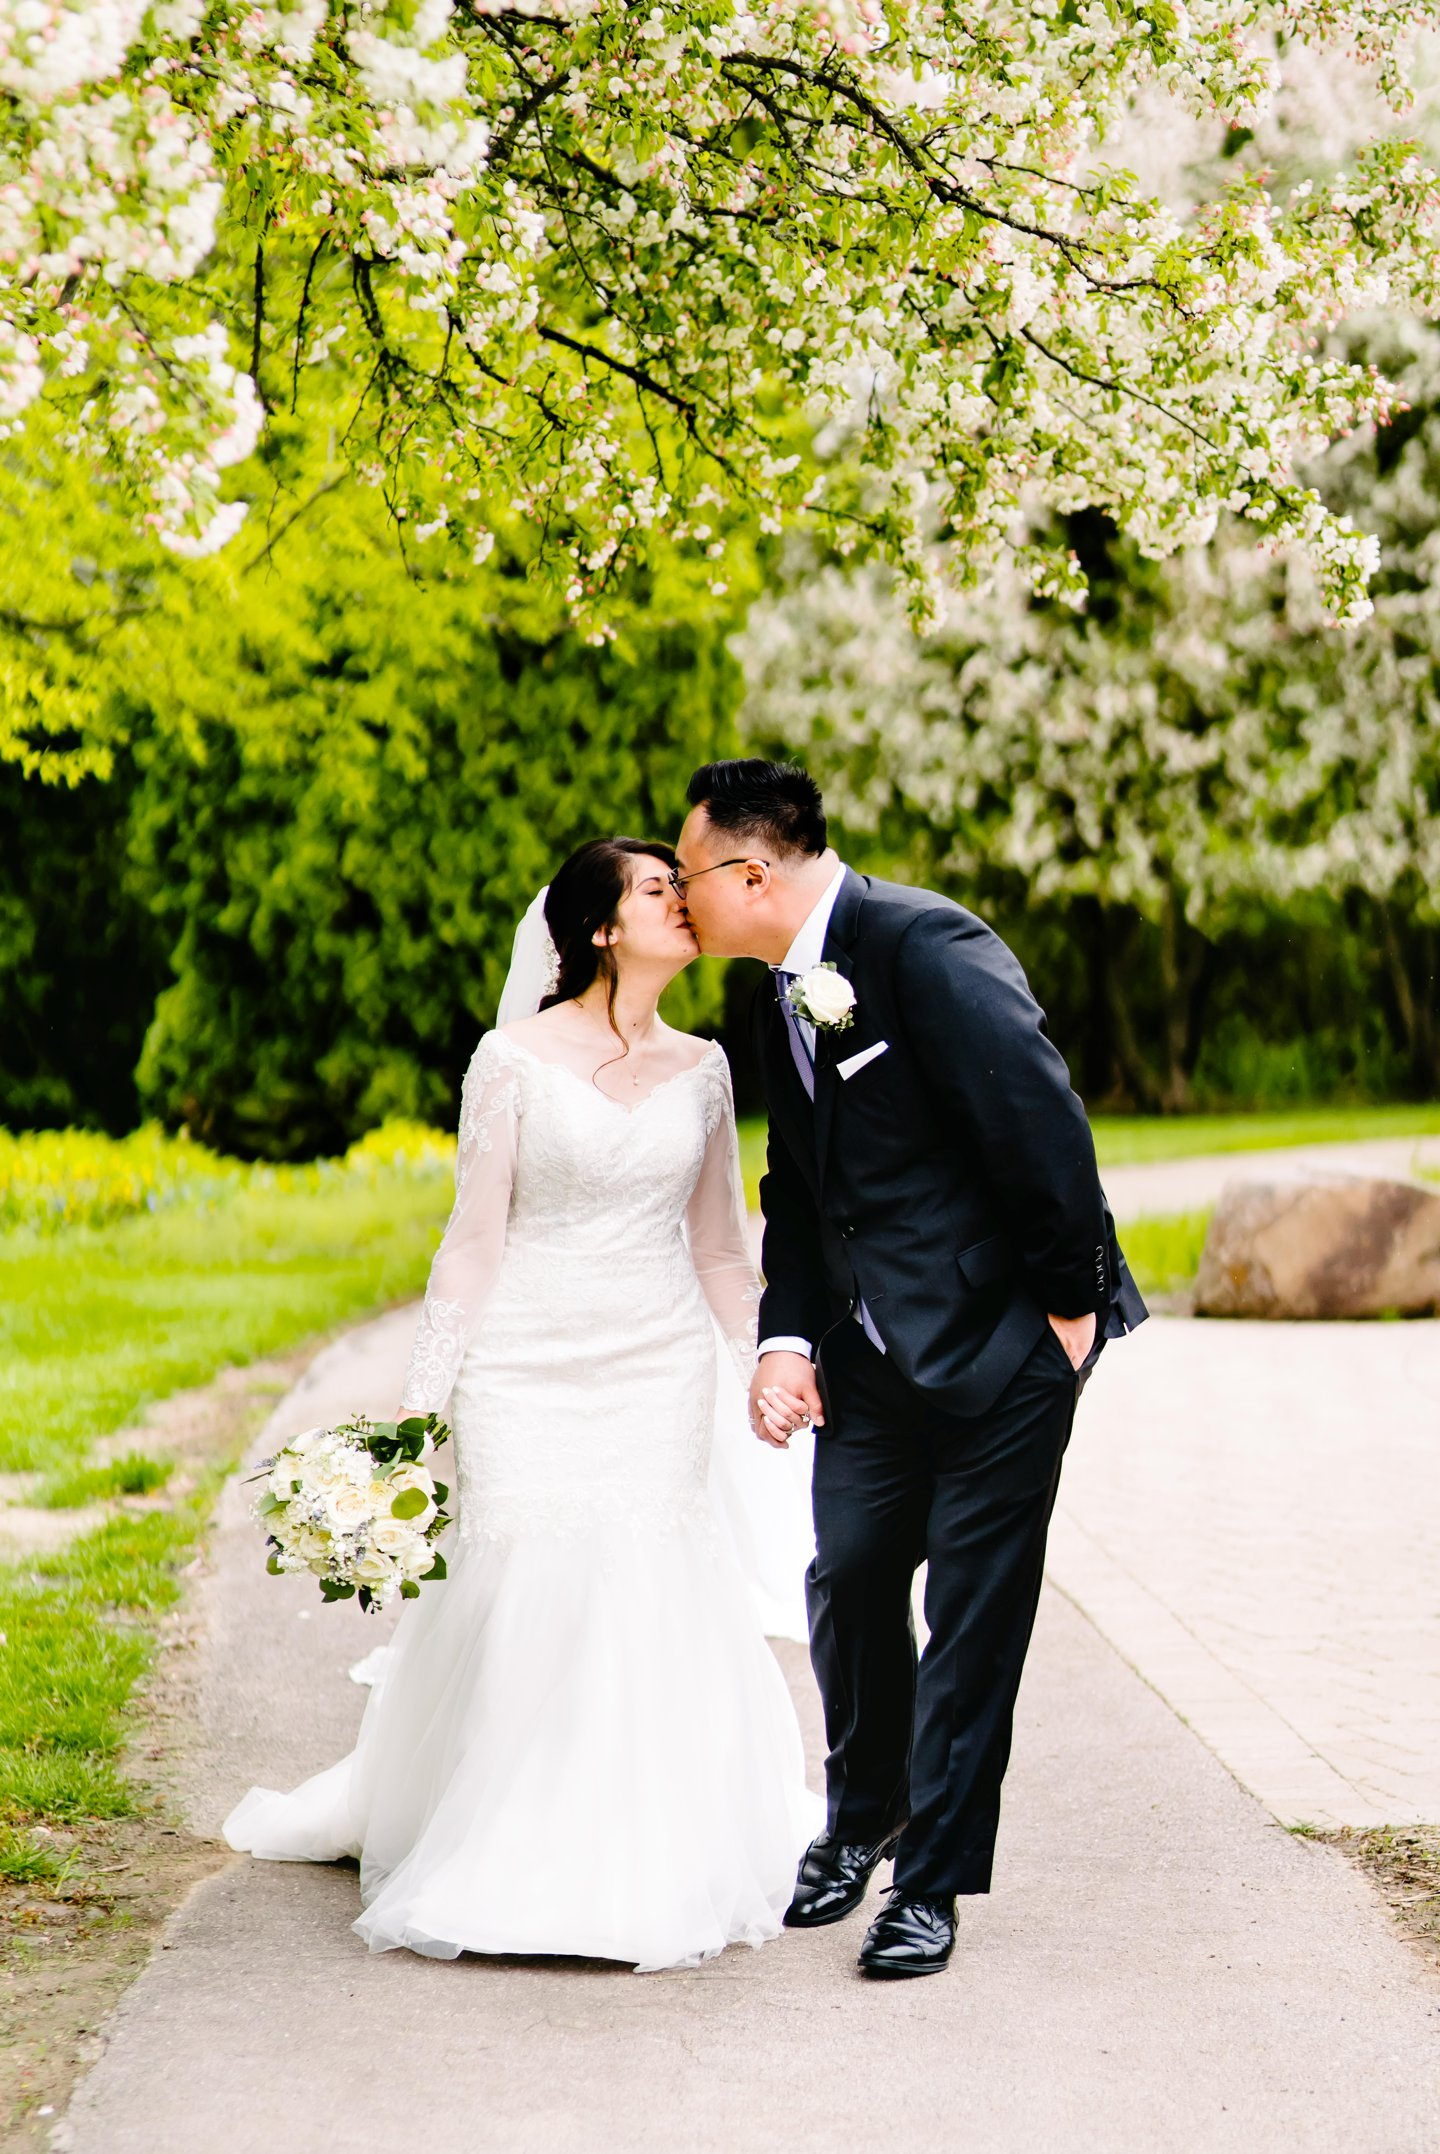 lake-geneva-fine-art-wedding-photographer-santos51